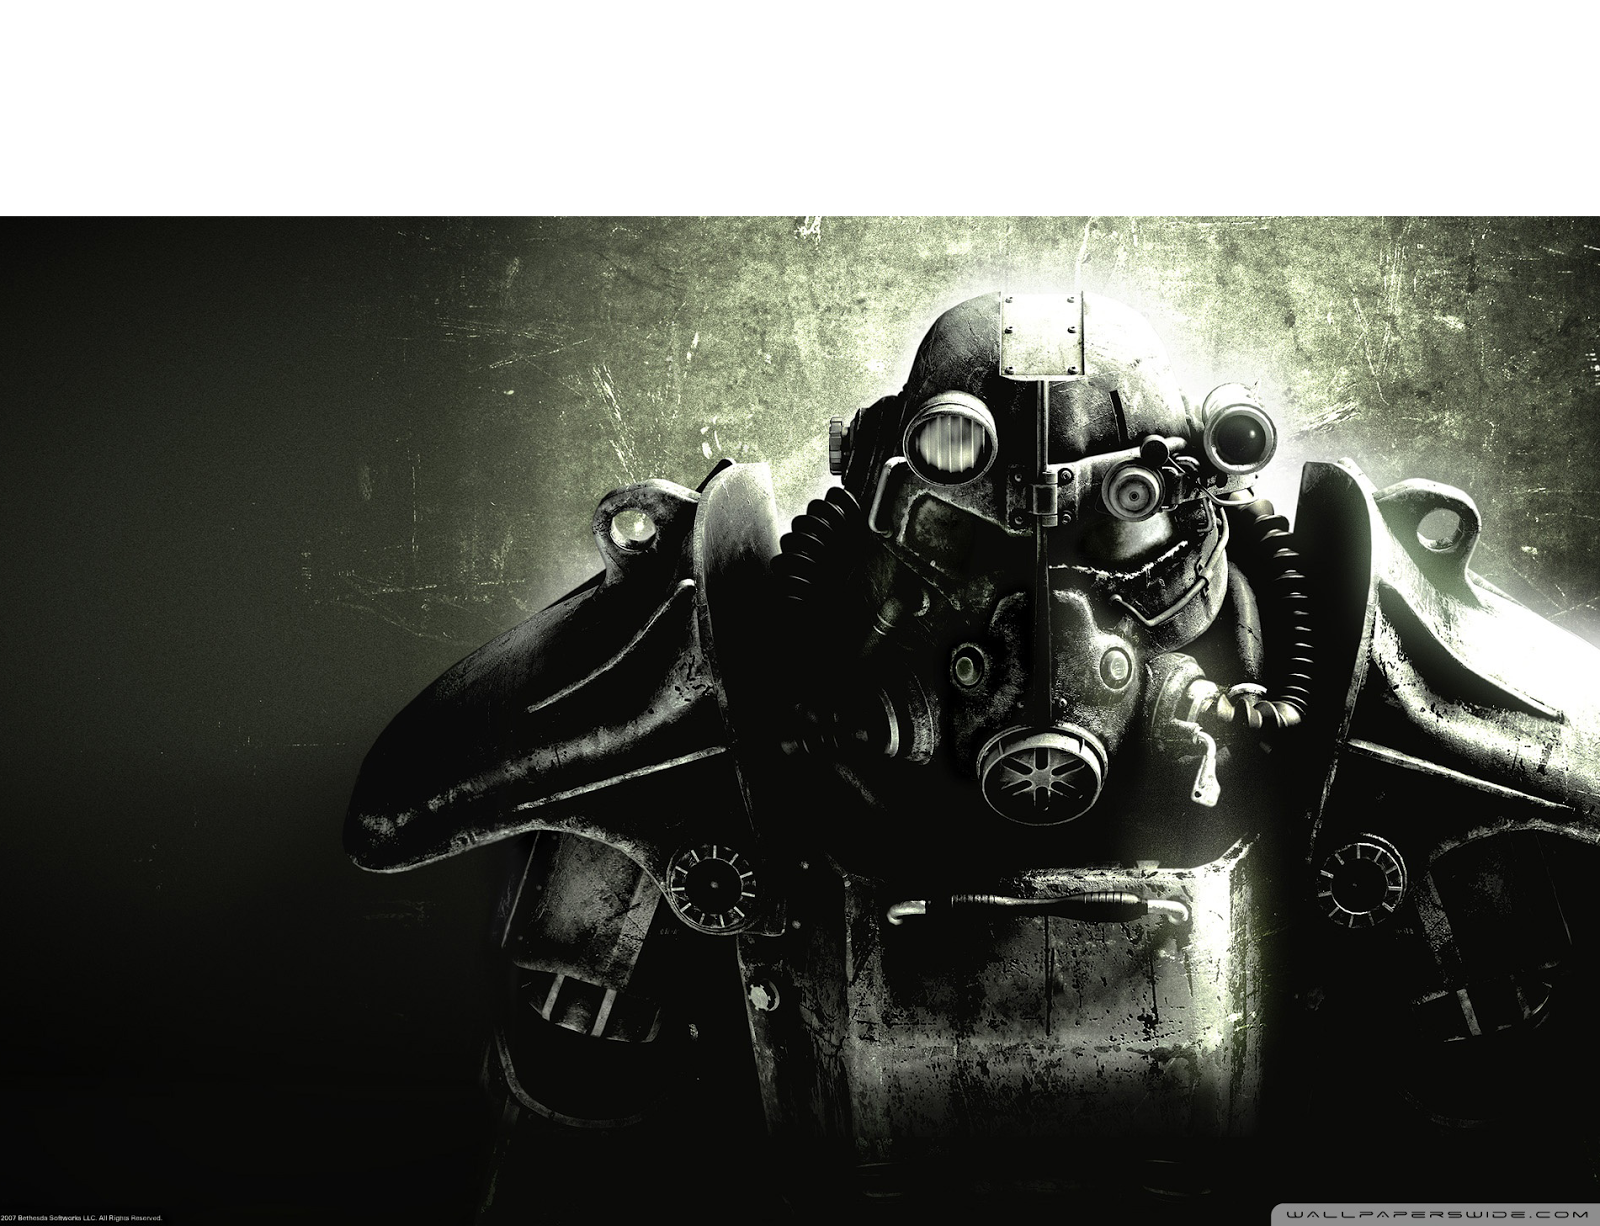 http://radioaktywne-recenzje.blogspot.com/2013/09/fallout-3.html